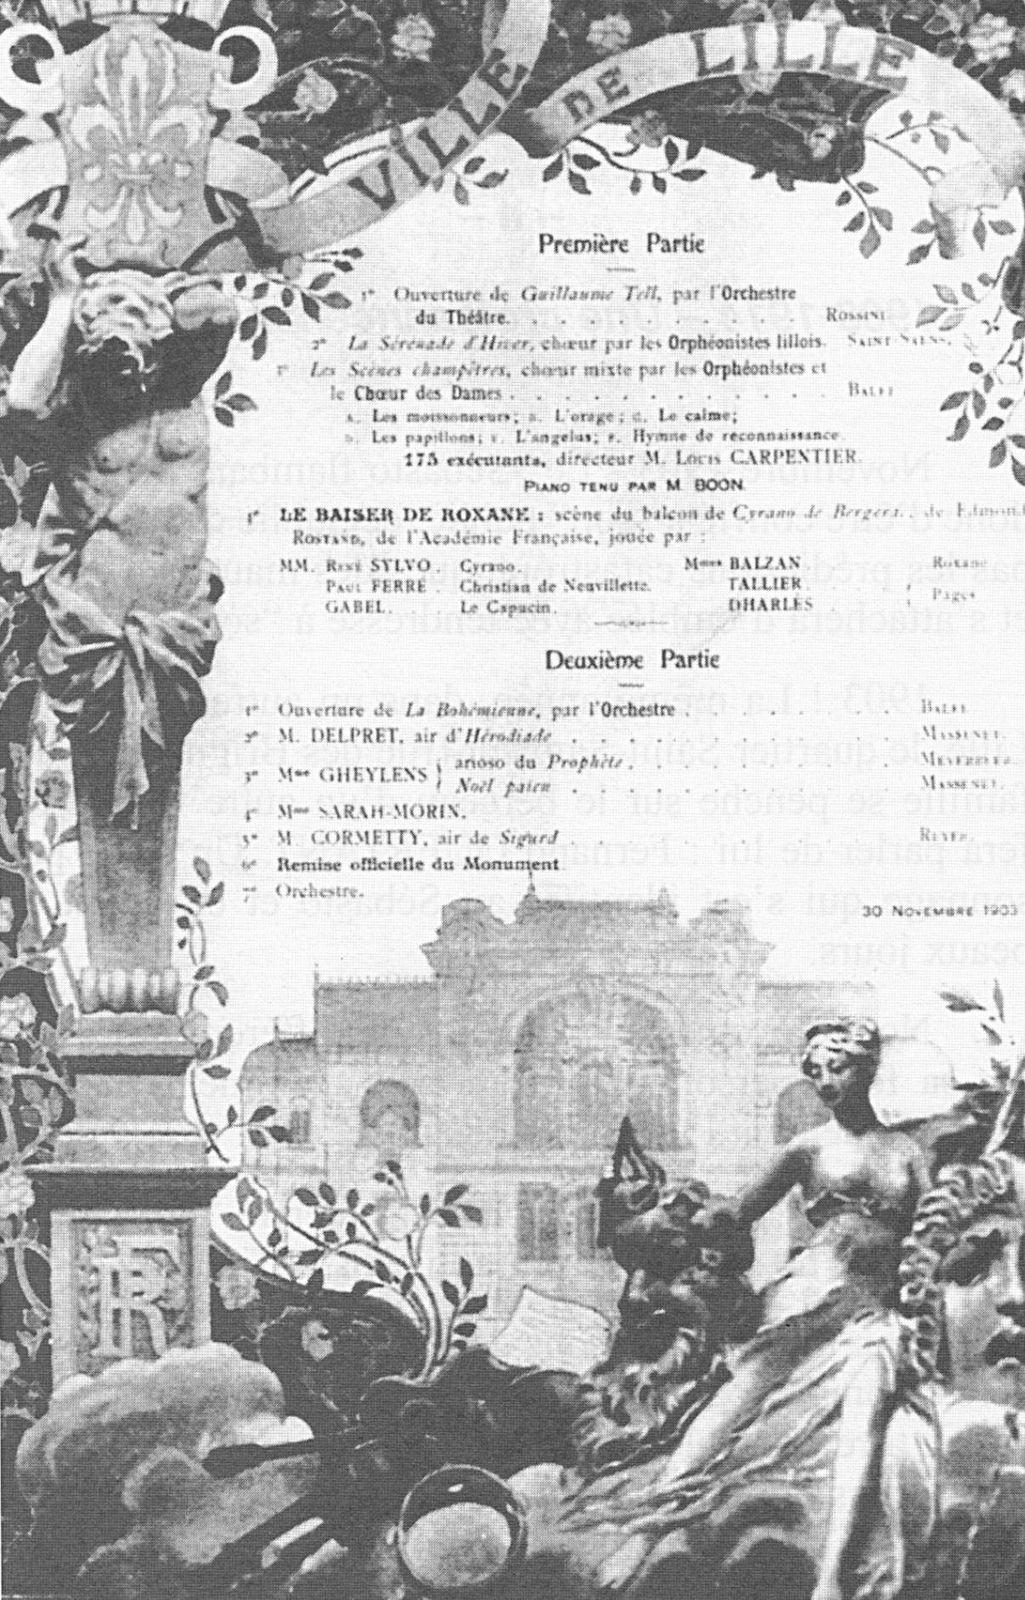 Programme du concert inaugural le 30 novembre 1903